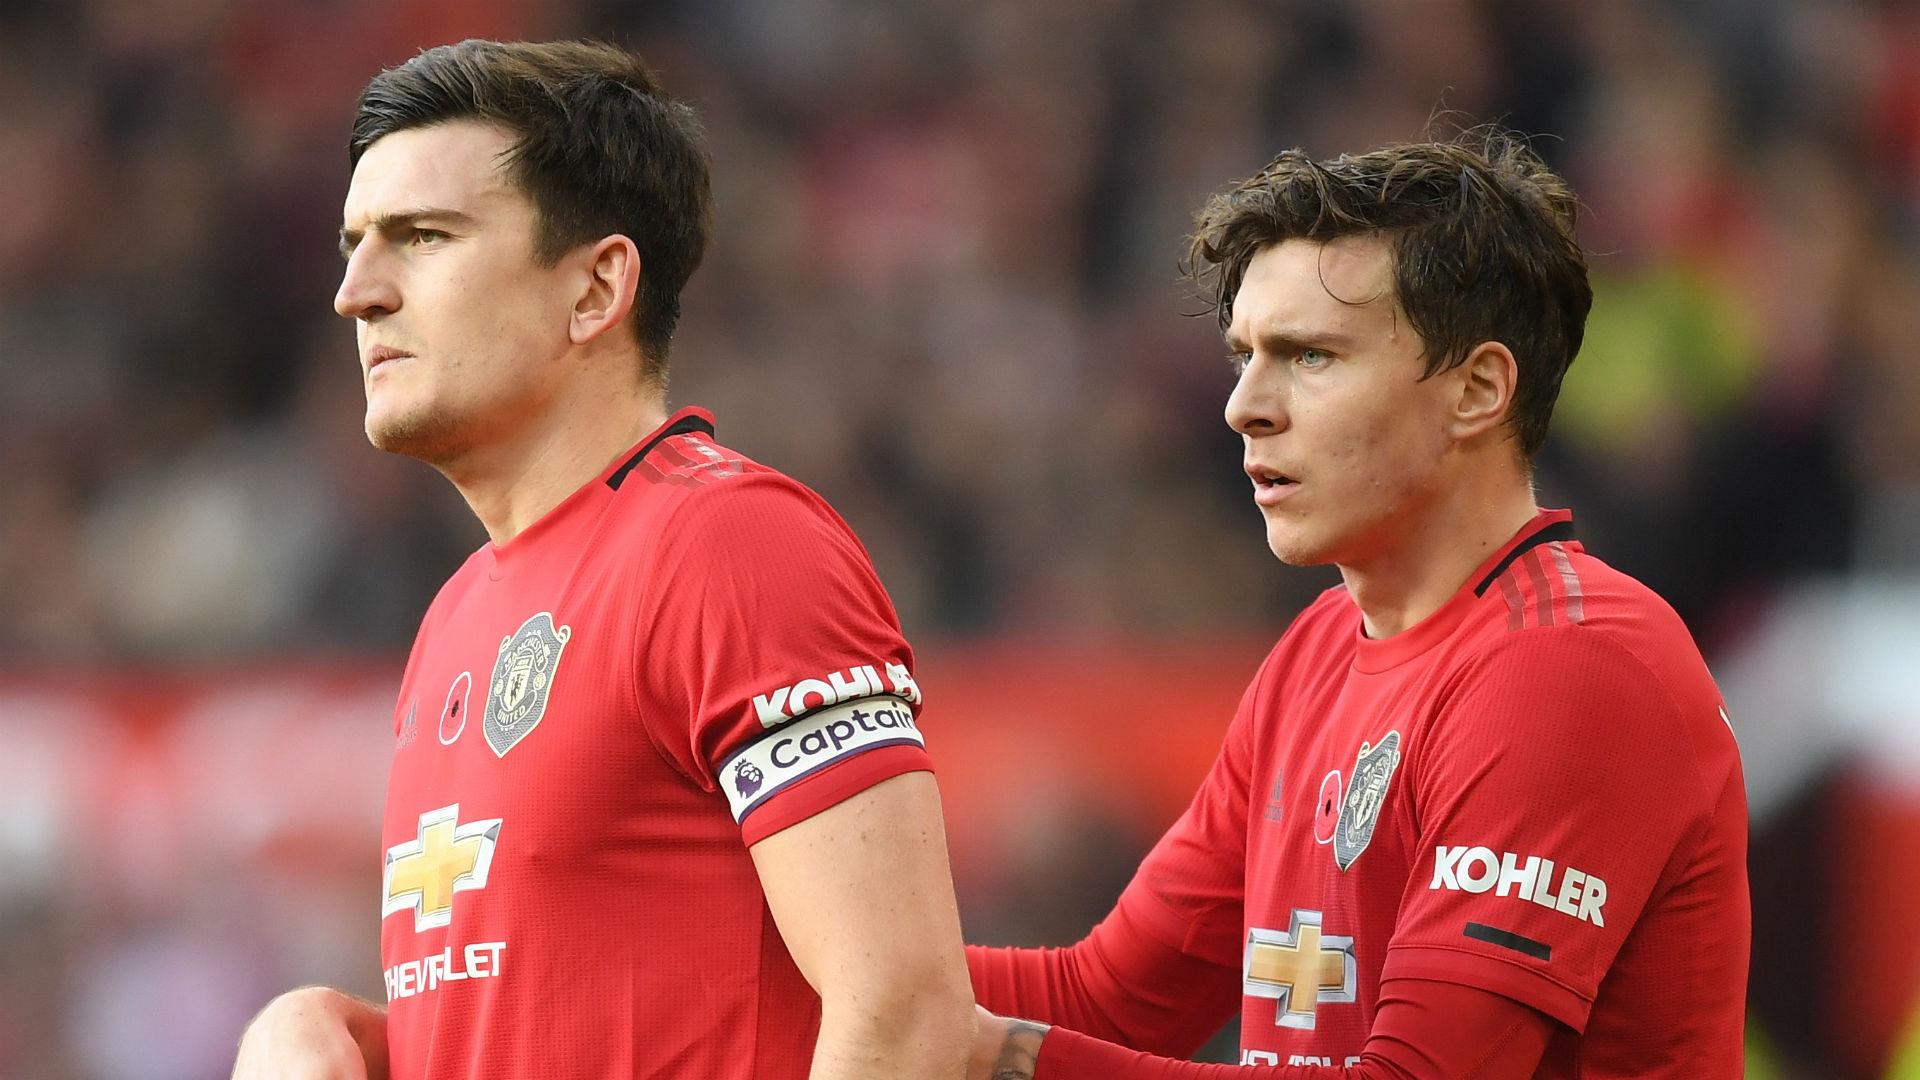 Manchester United Diharapkan Tidak Boyong Bek Baru - Gilabola.com